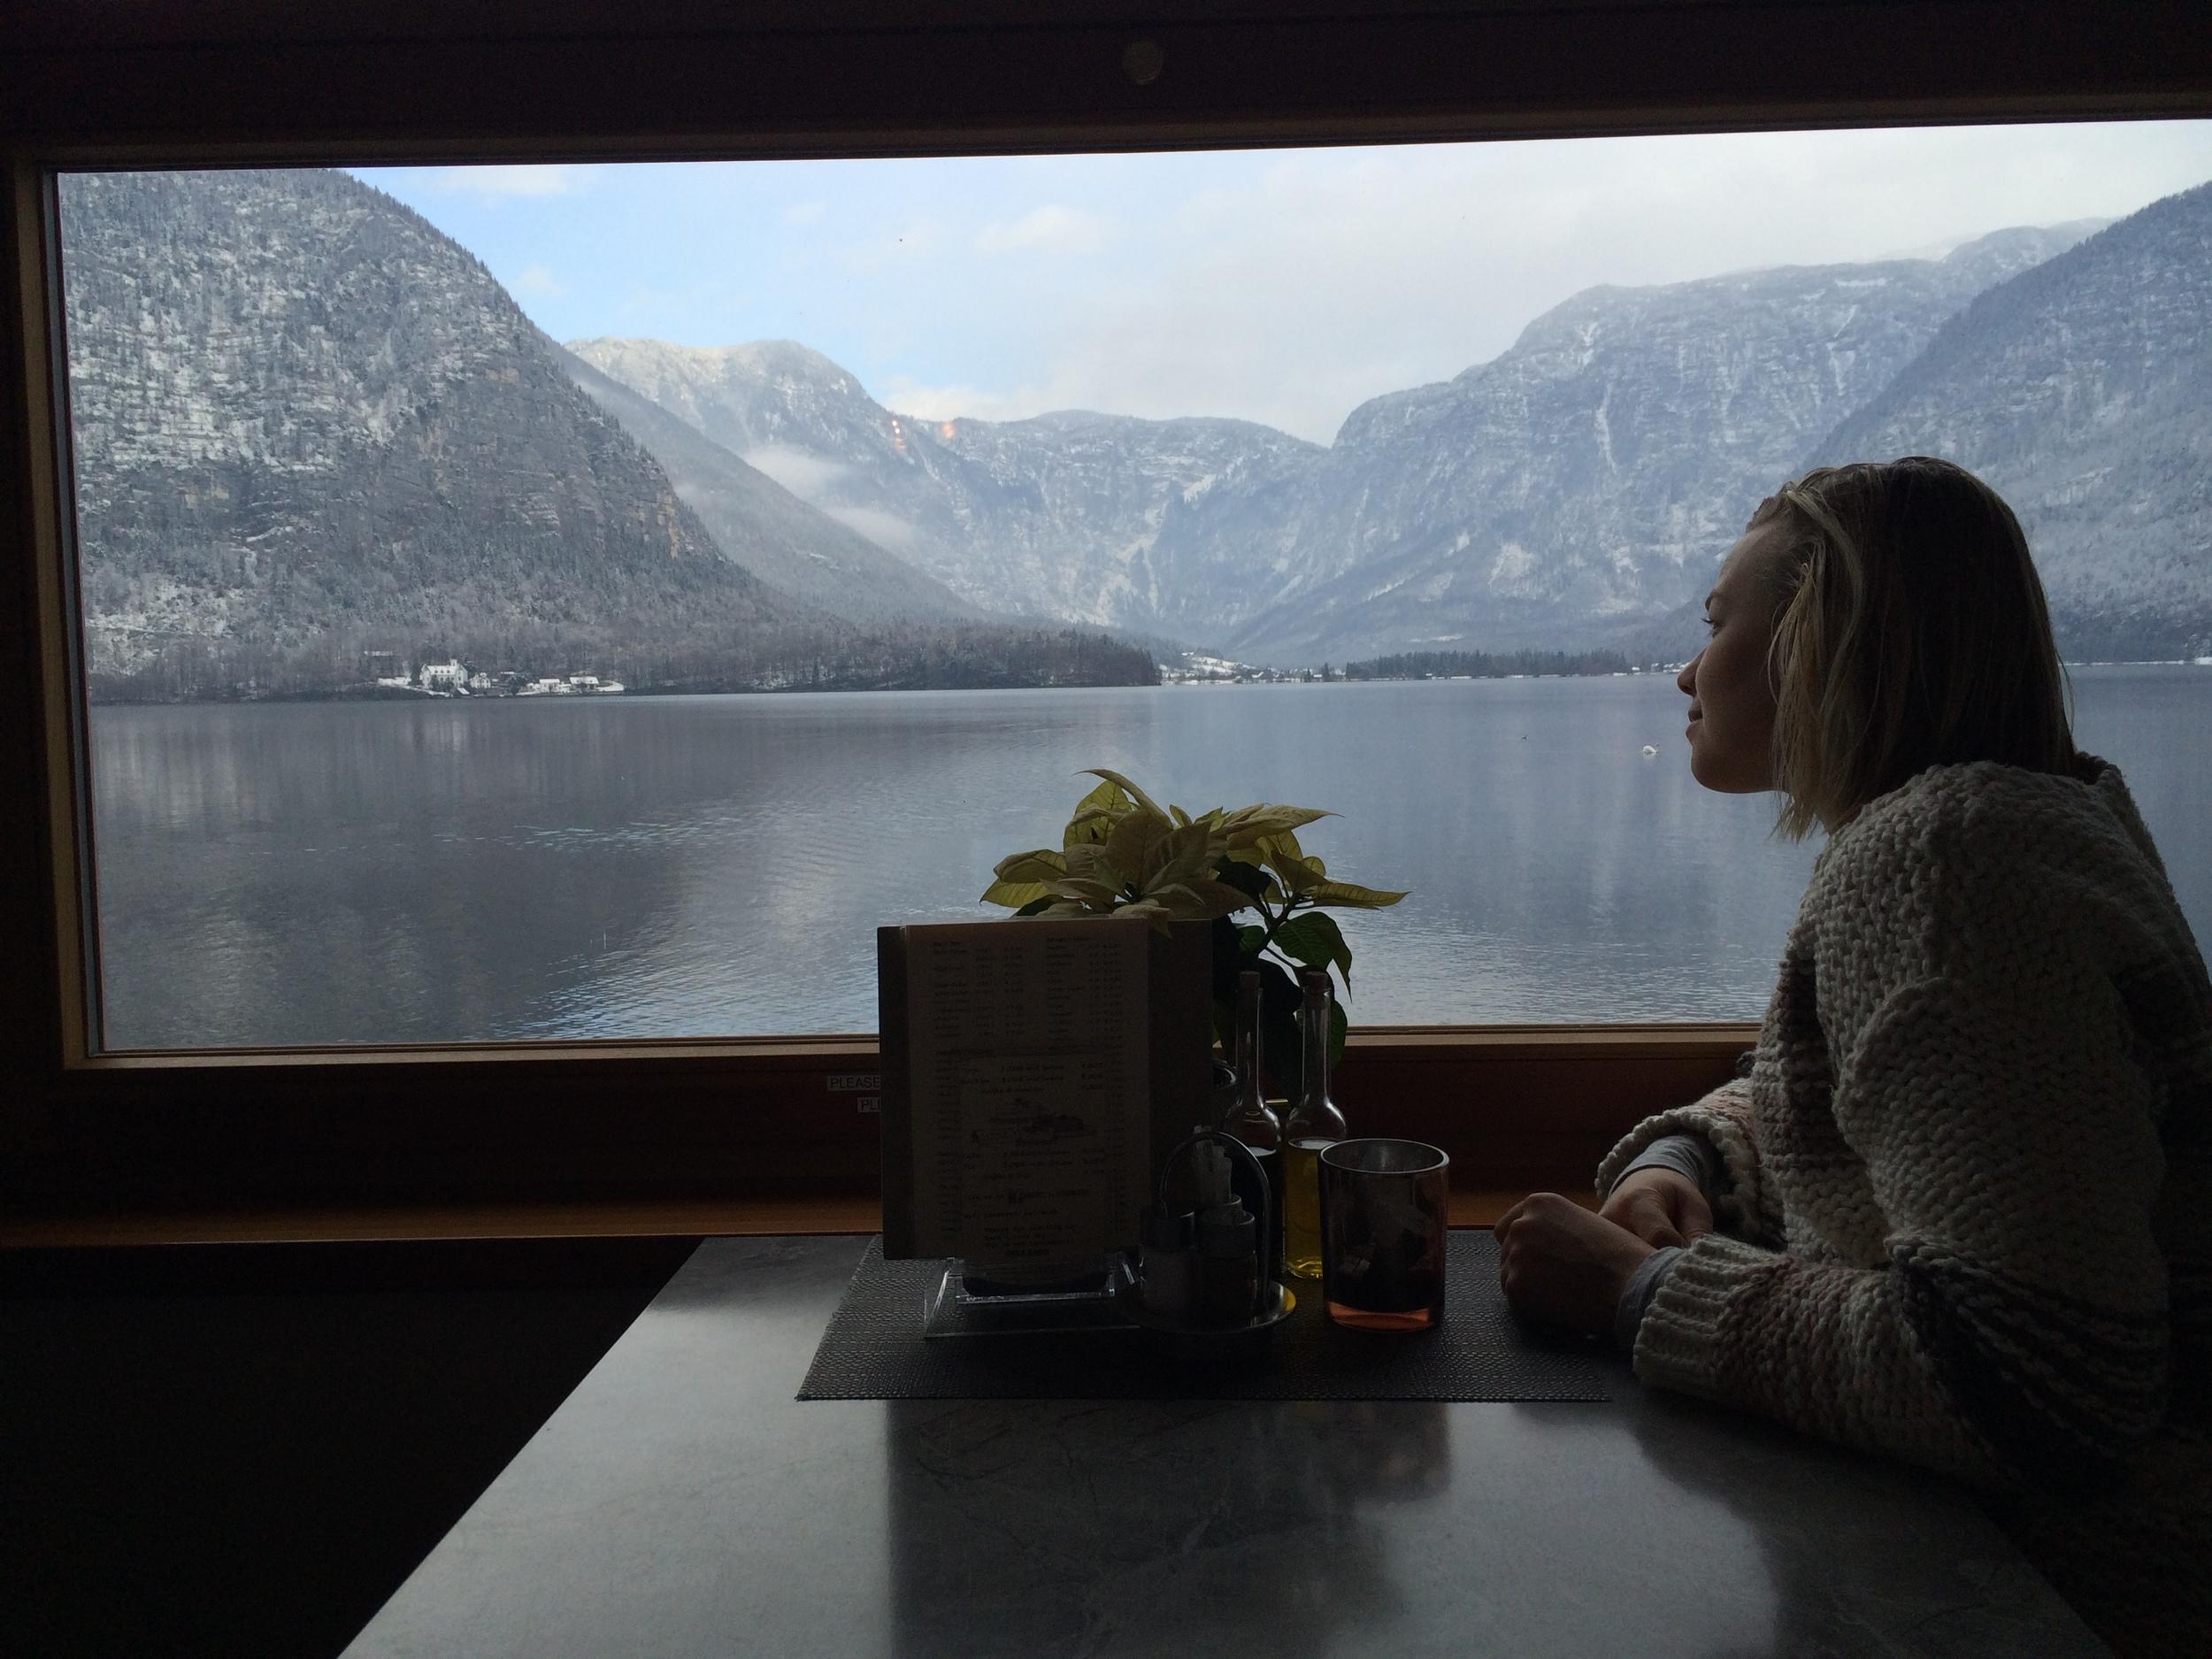 Meatstrudel soup with this view. - Hallstatt, Austria